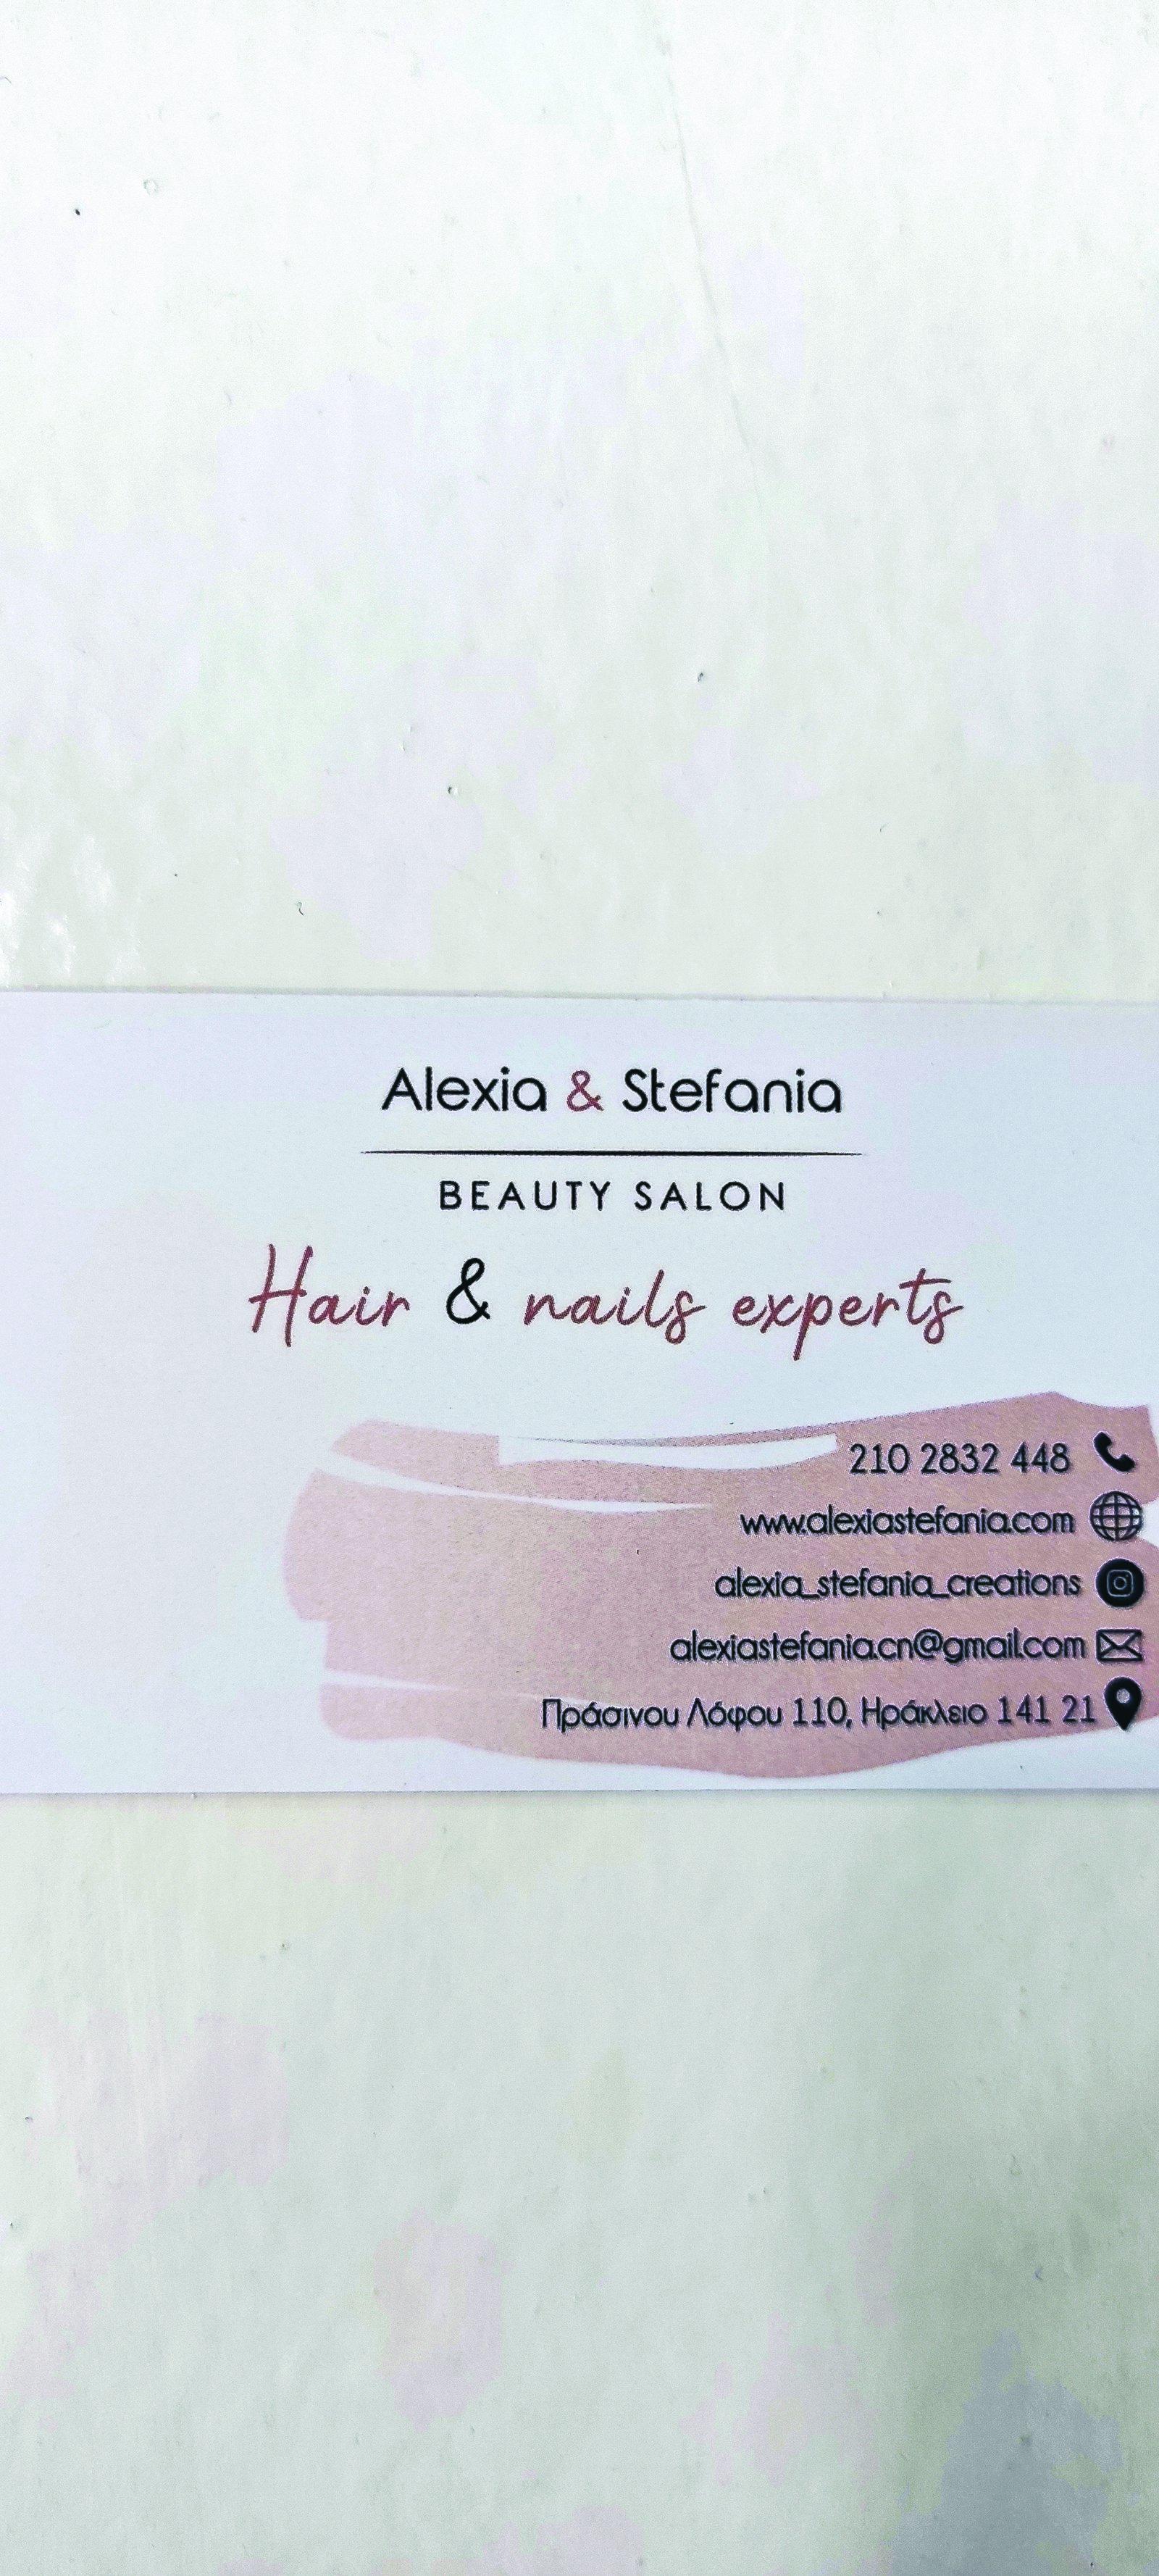 Alexia & Stefania Beauty Salon